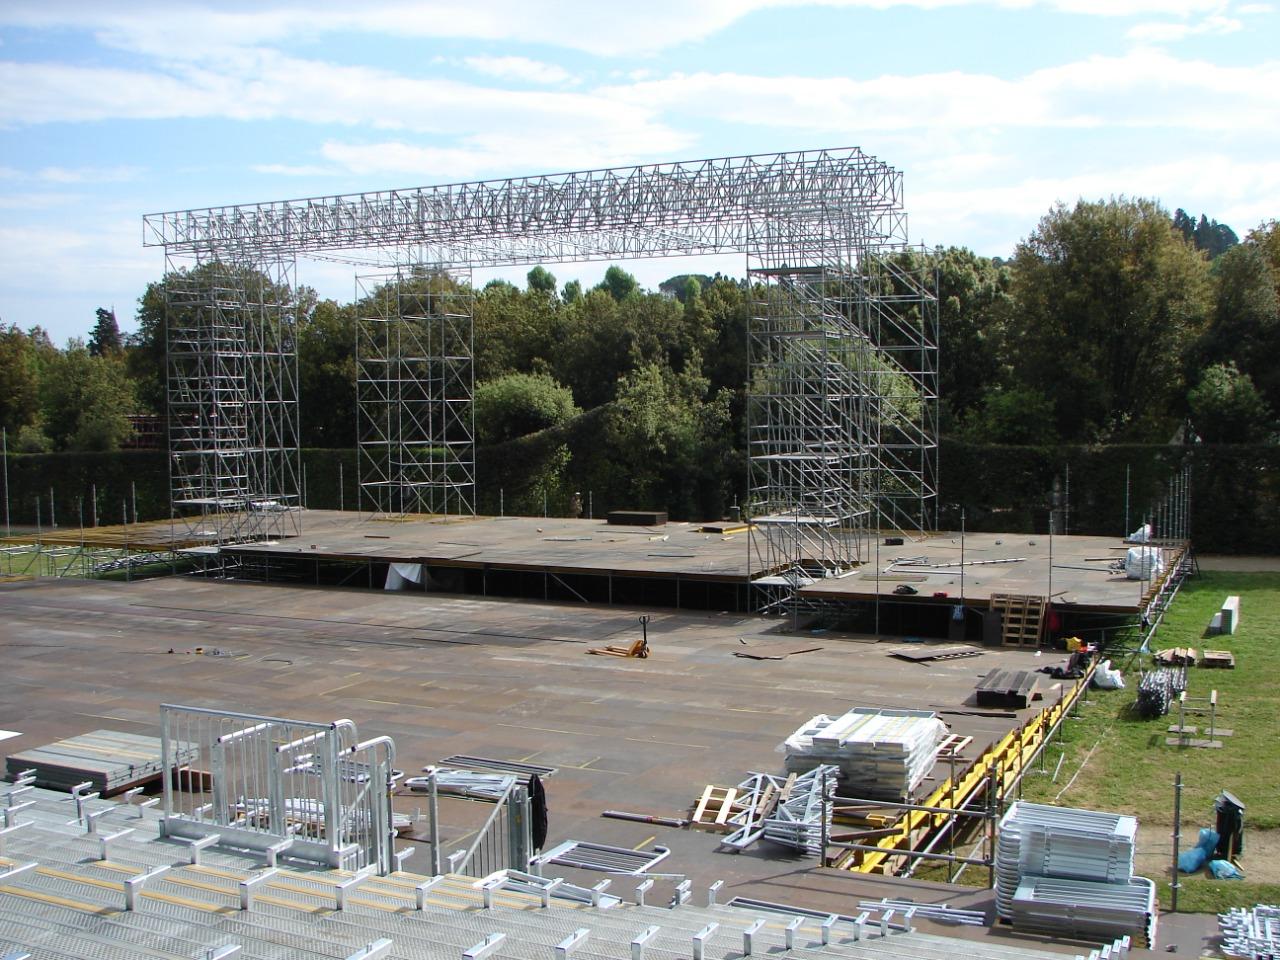 Gallery foto n.2 TMC beams for coverage - Opera festival